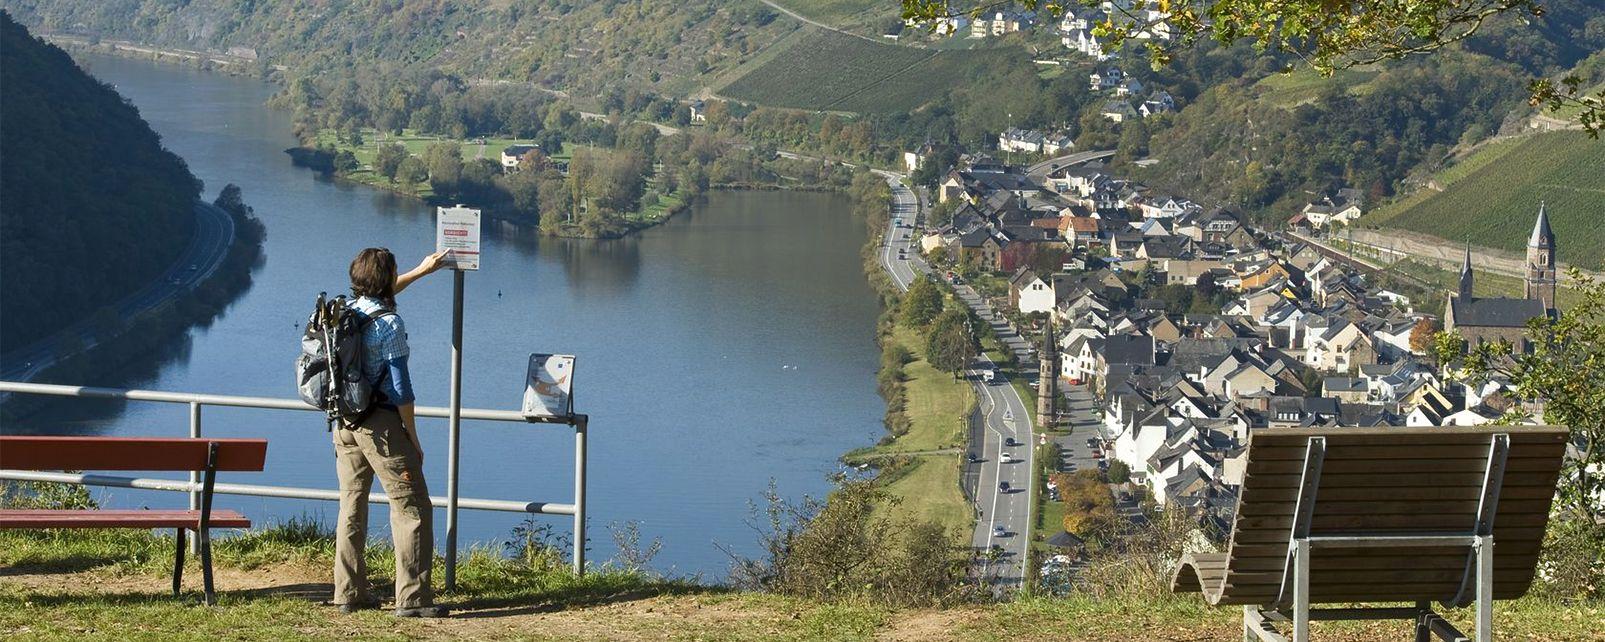 La randonnée en Meuse , Francia